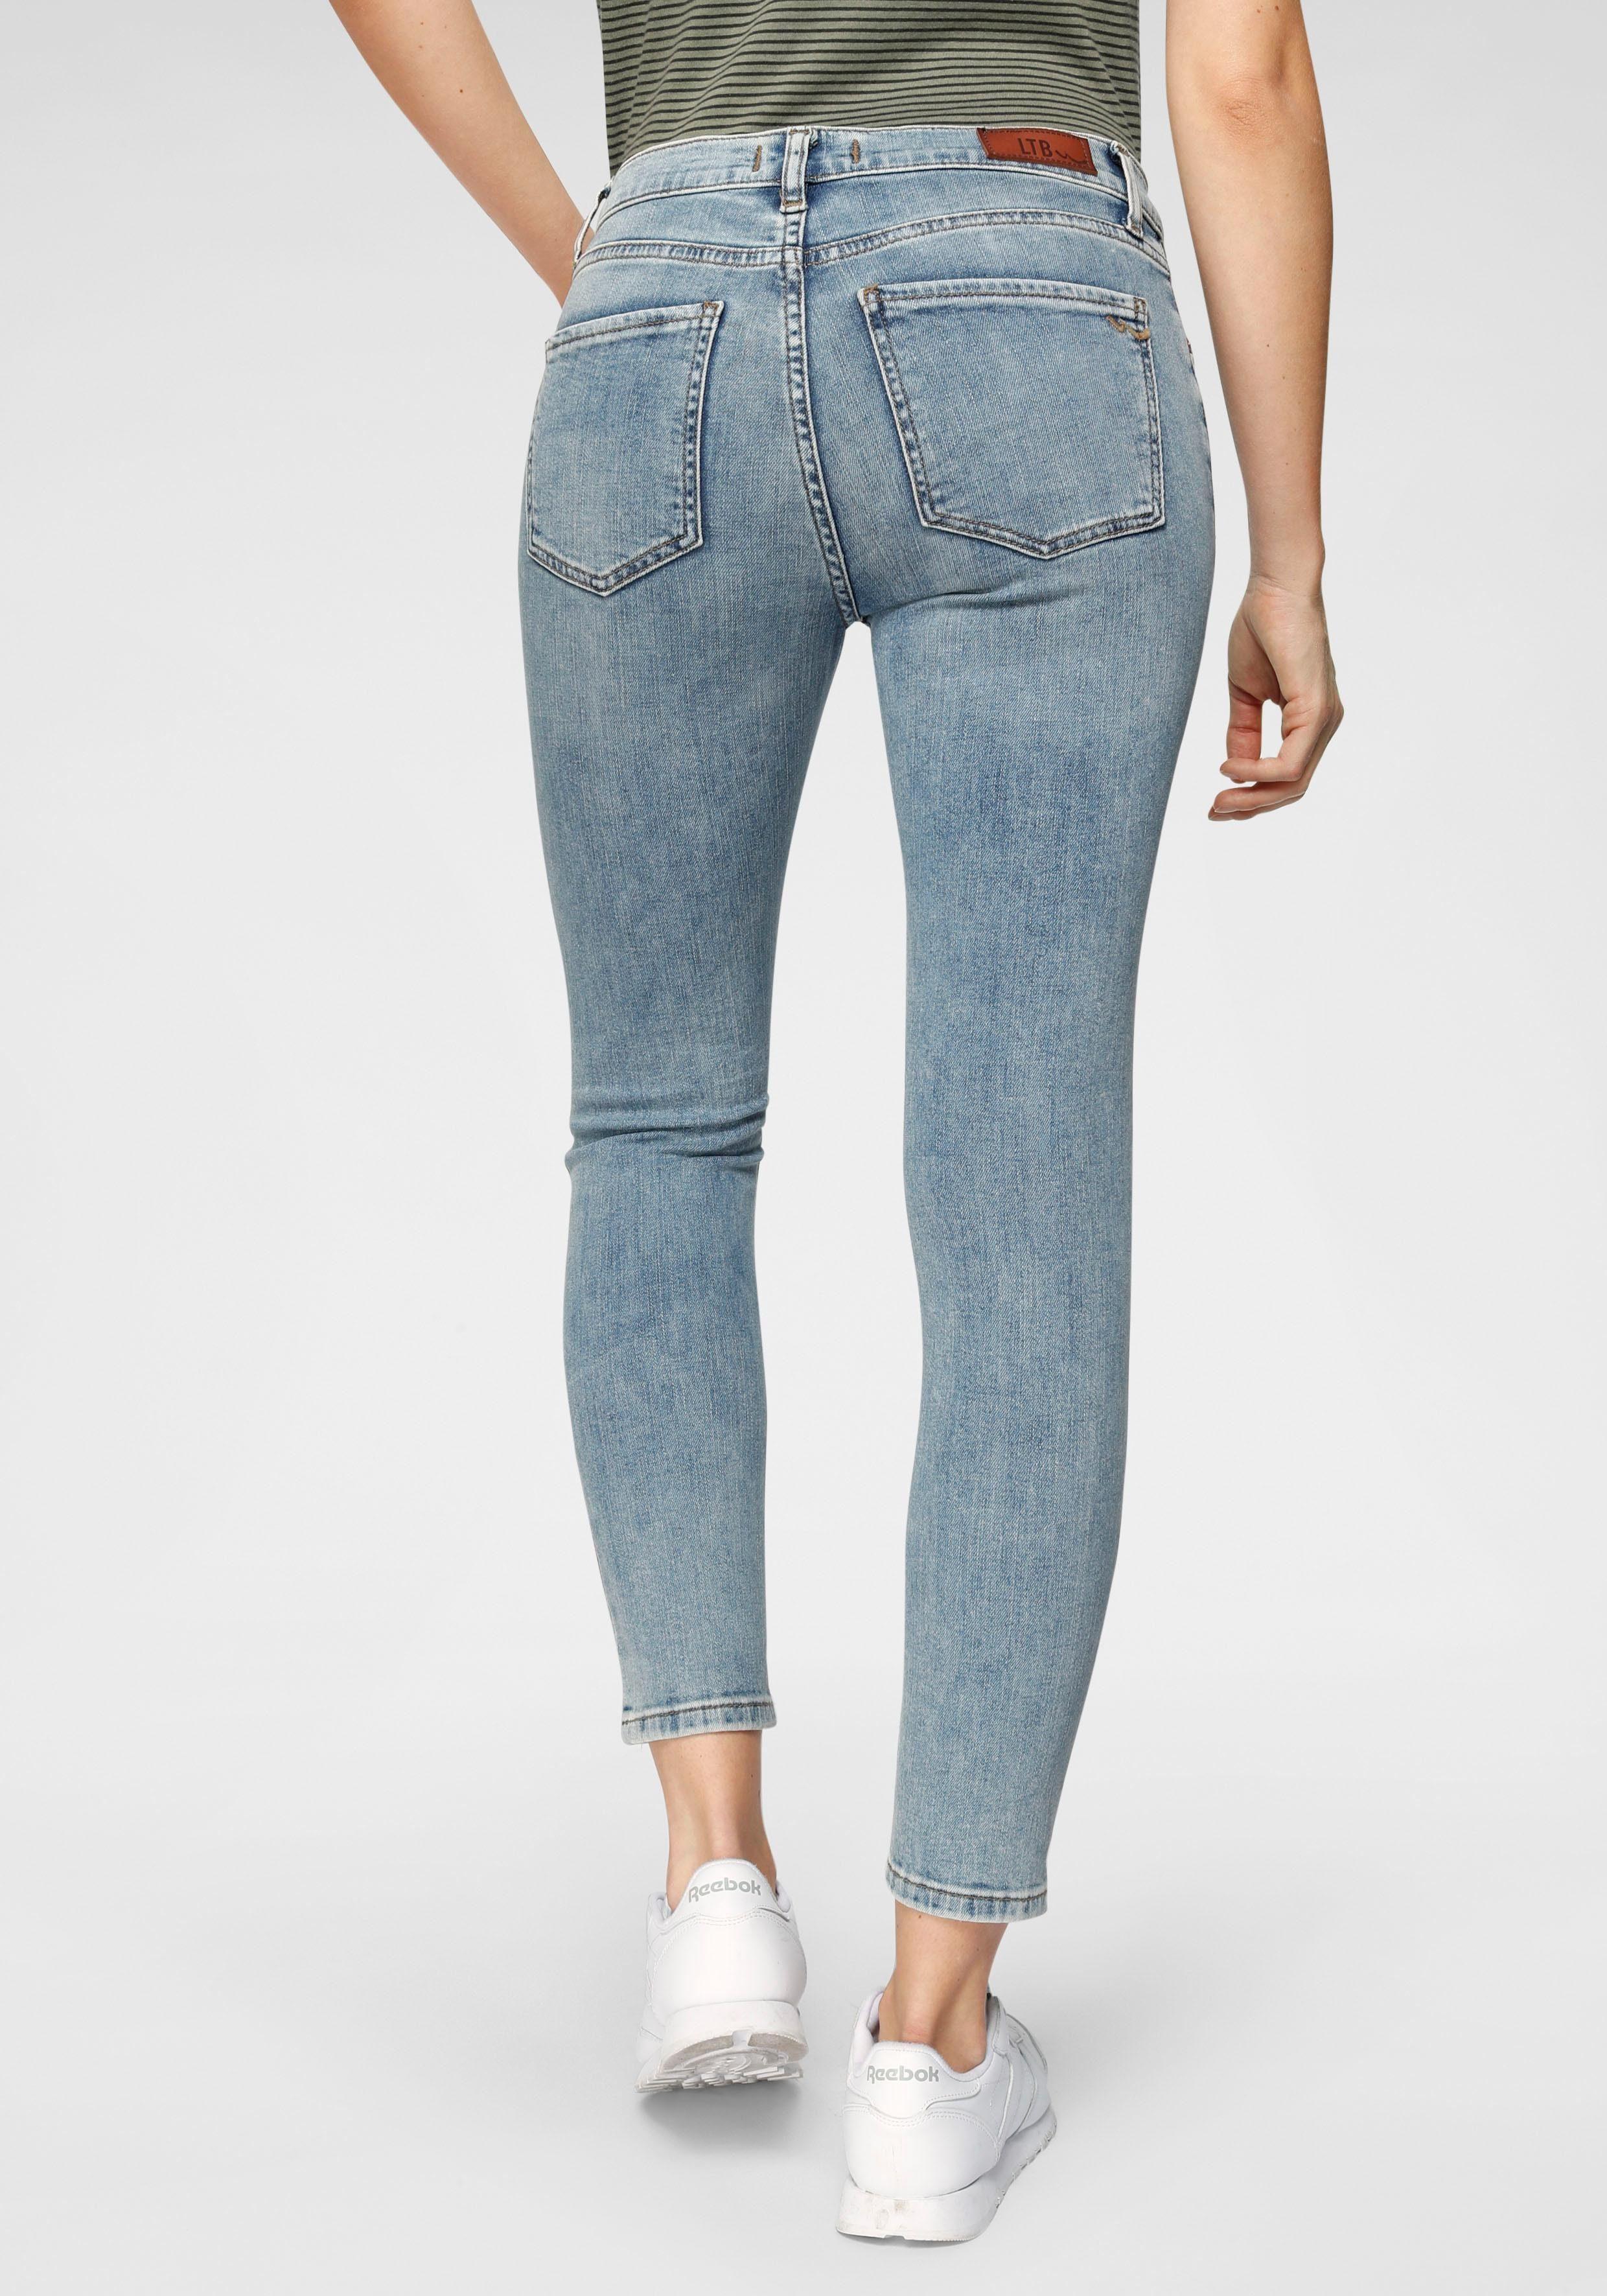 LTB Skinny fit Jeans »LONIA« mit extra kurzem Ankle Leg & Stretch Qualität online kaufen | OTTO